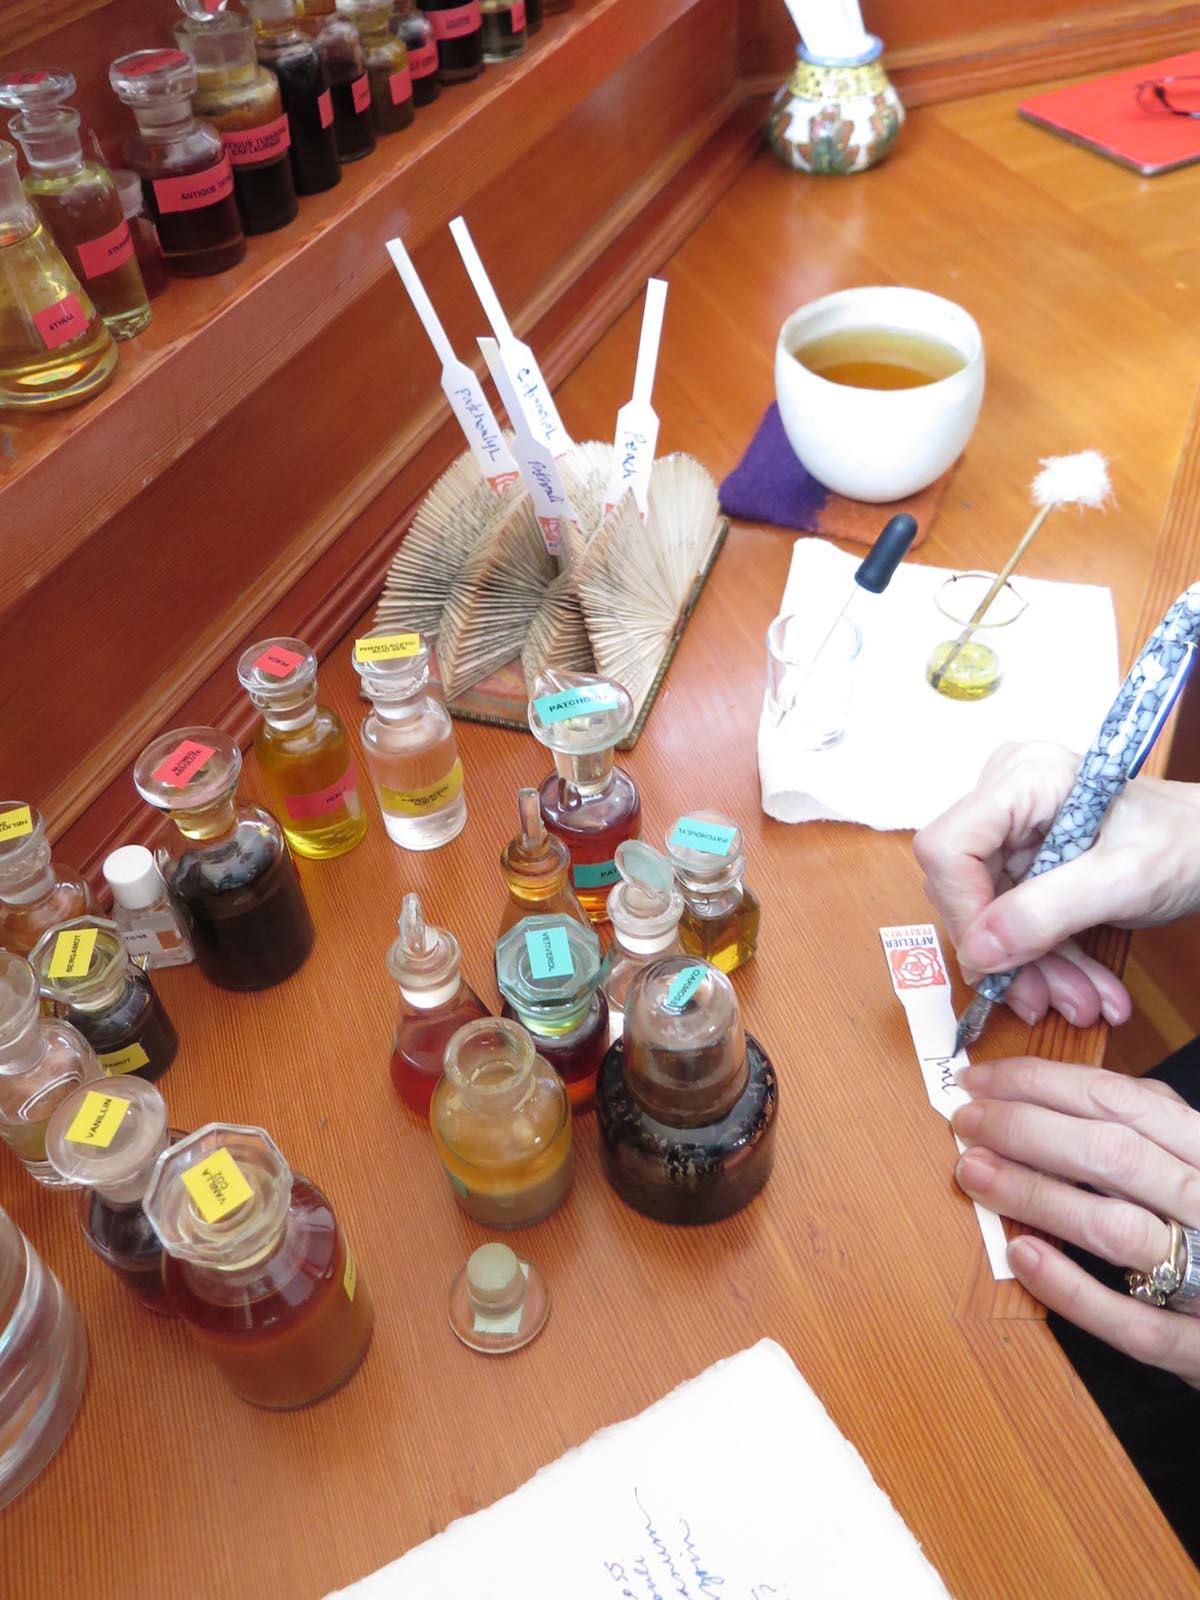 Mandy formulating a custom perfume